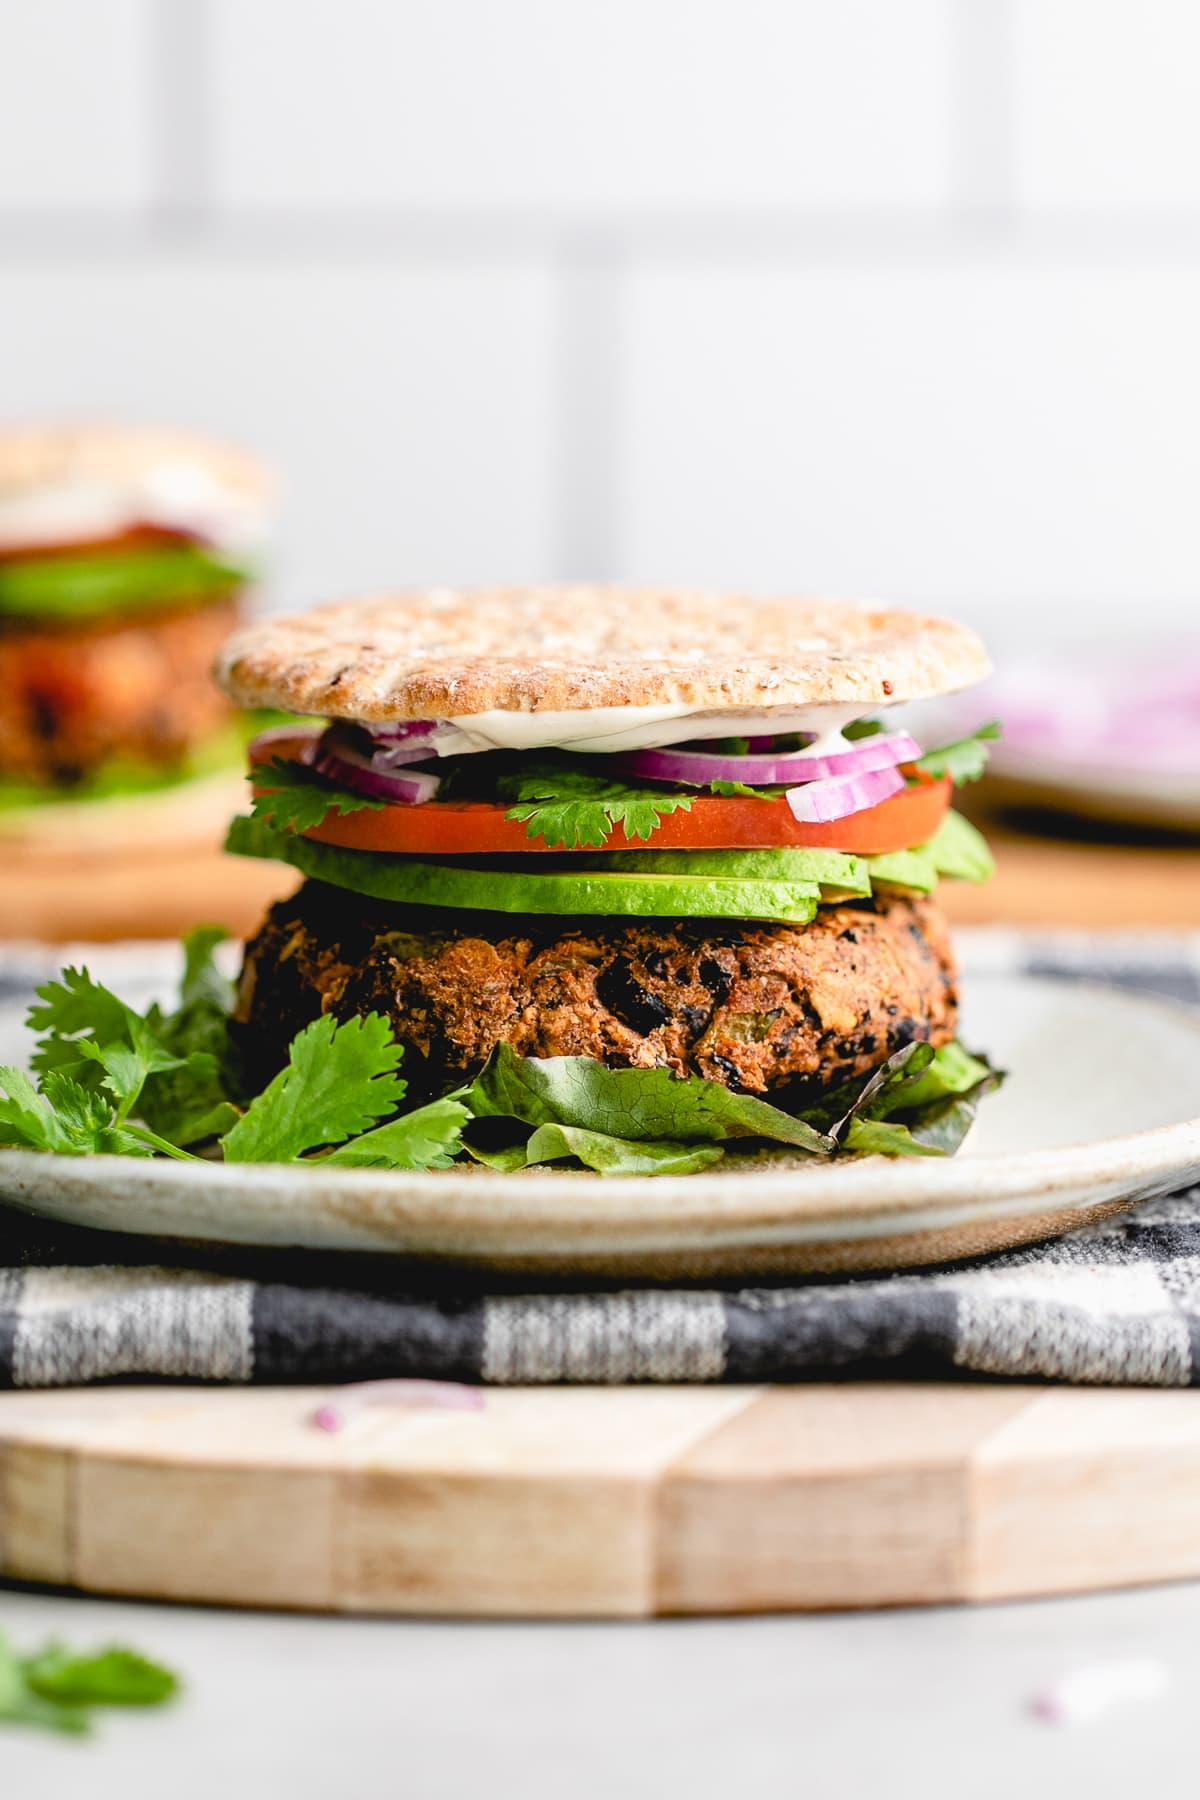 head on view of plated vegan black burger.